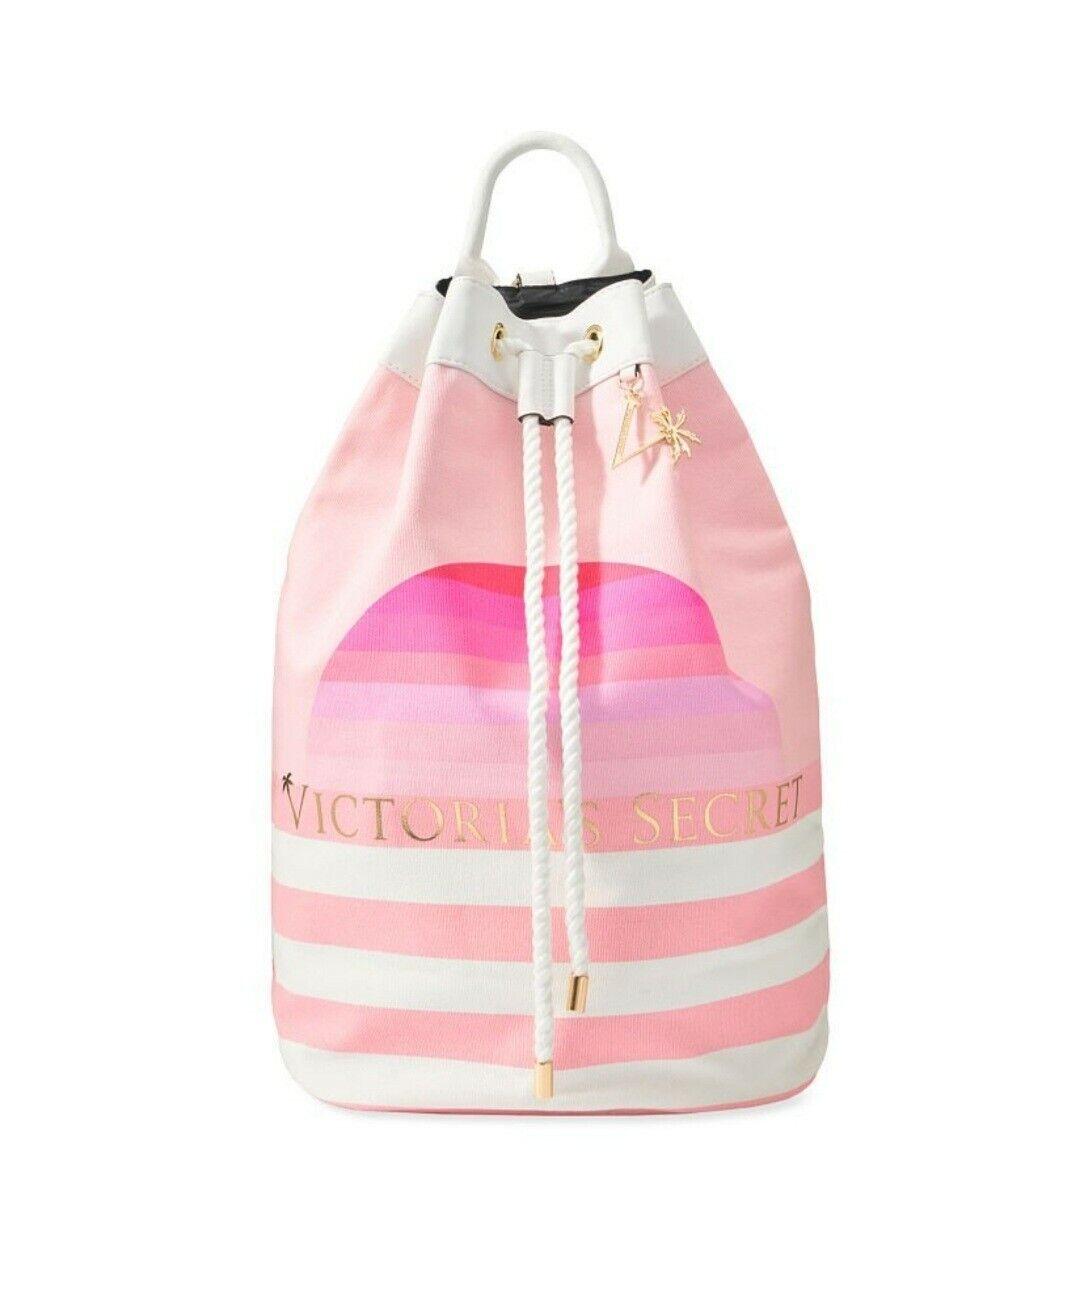 NWT Victoria Secret Striped Cinch Tote~backpack